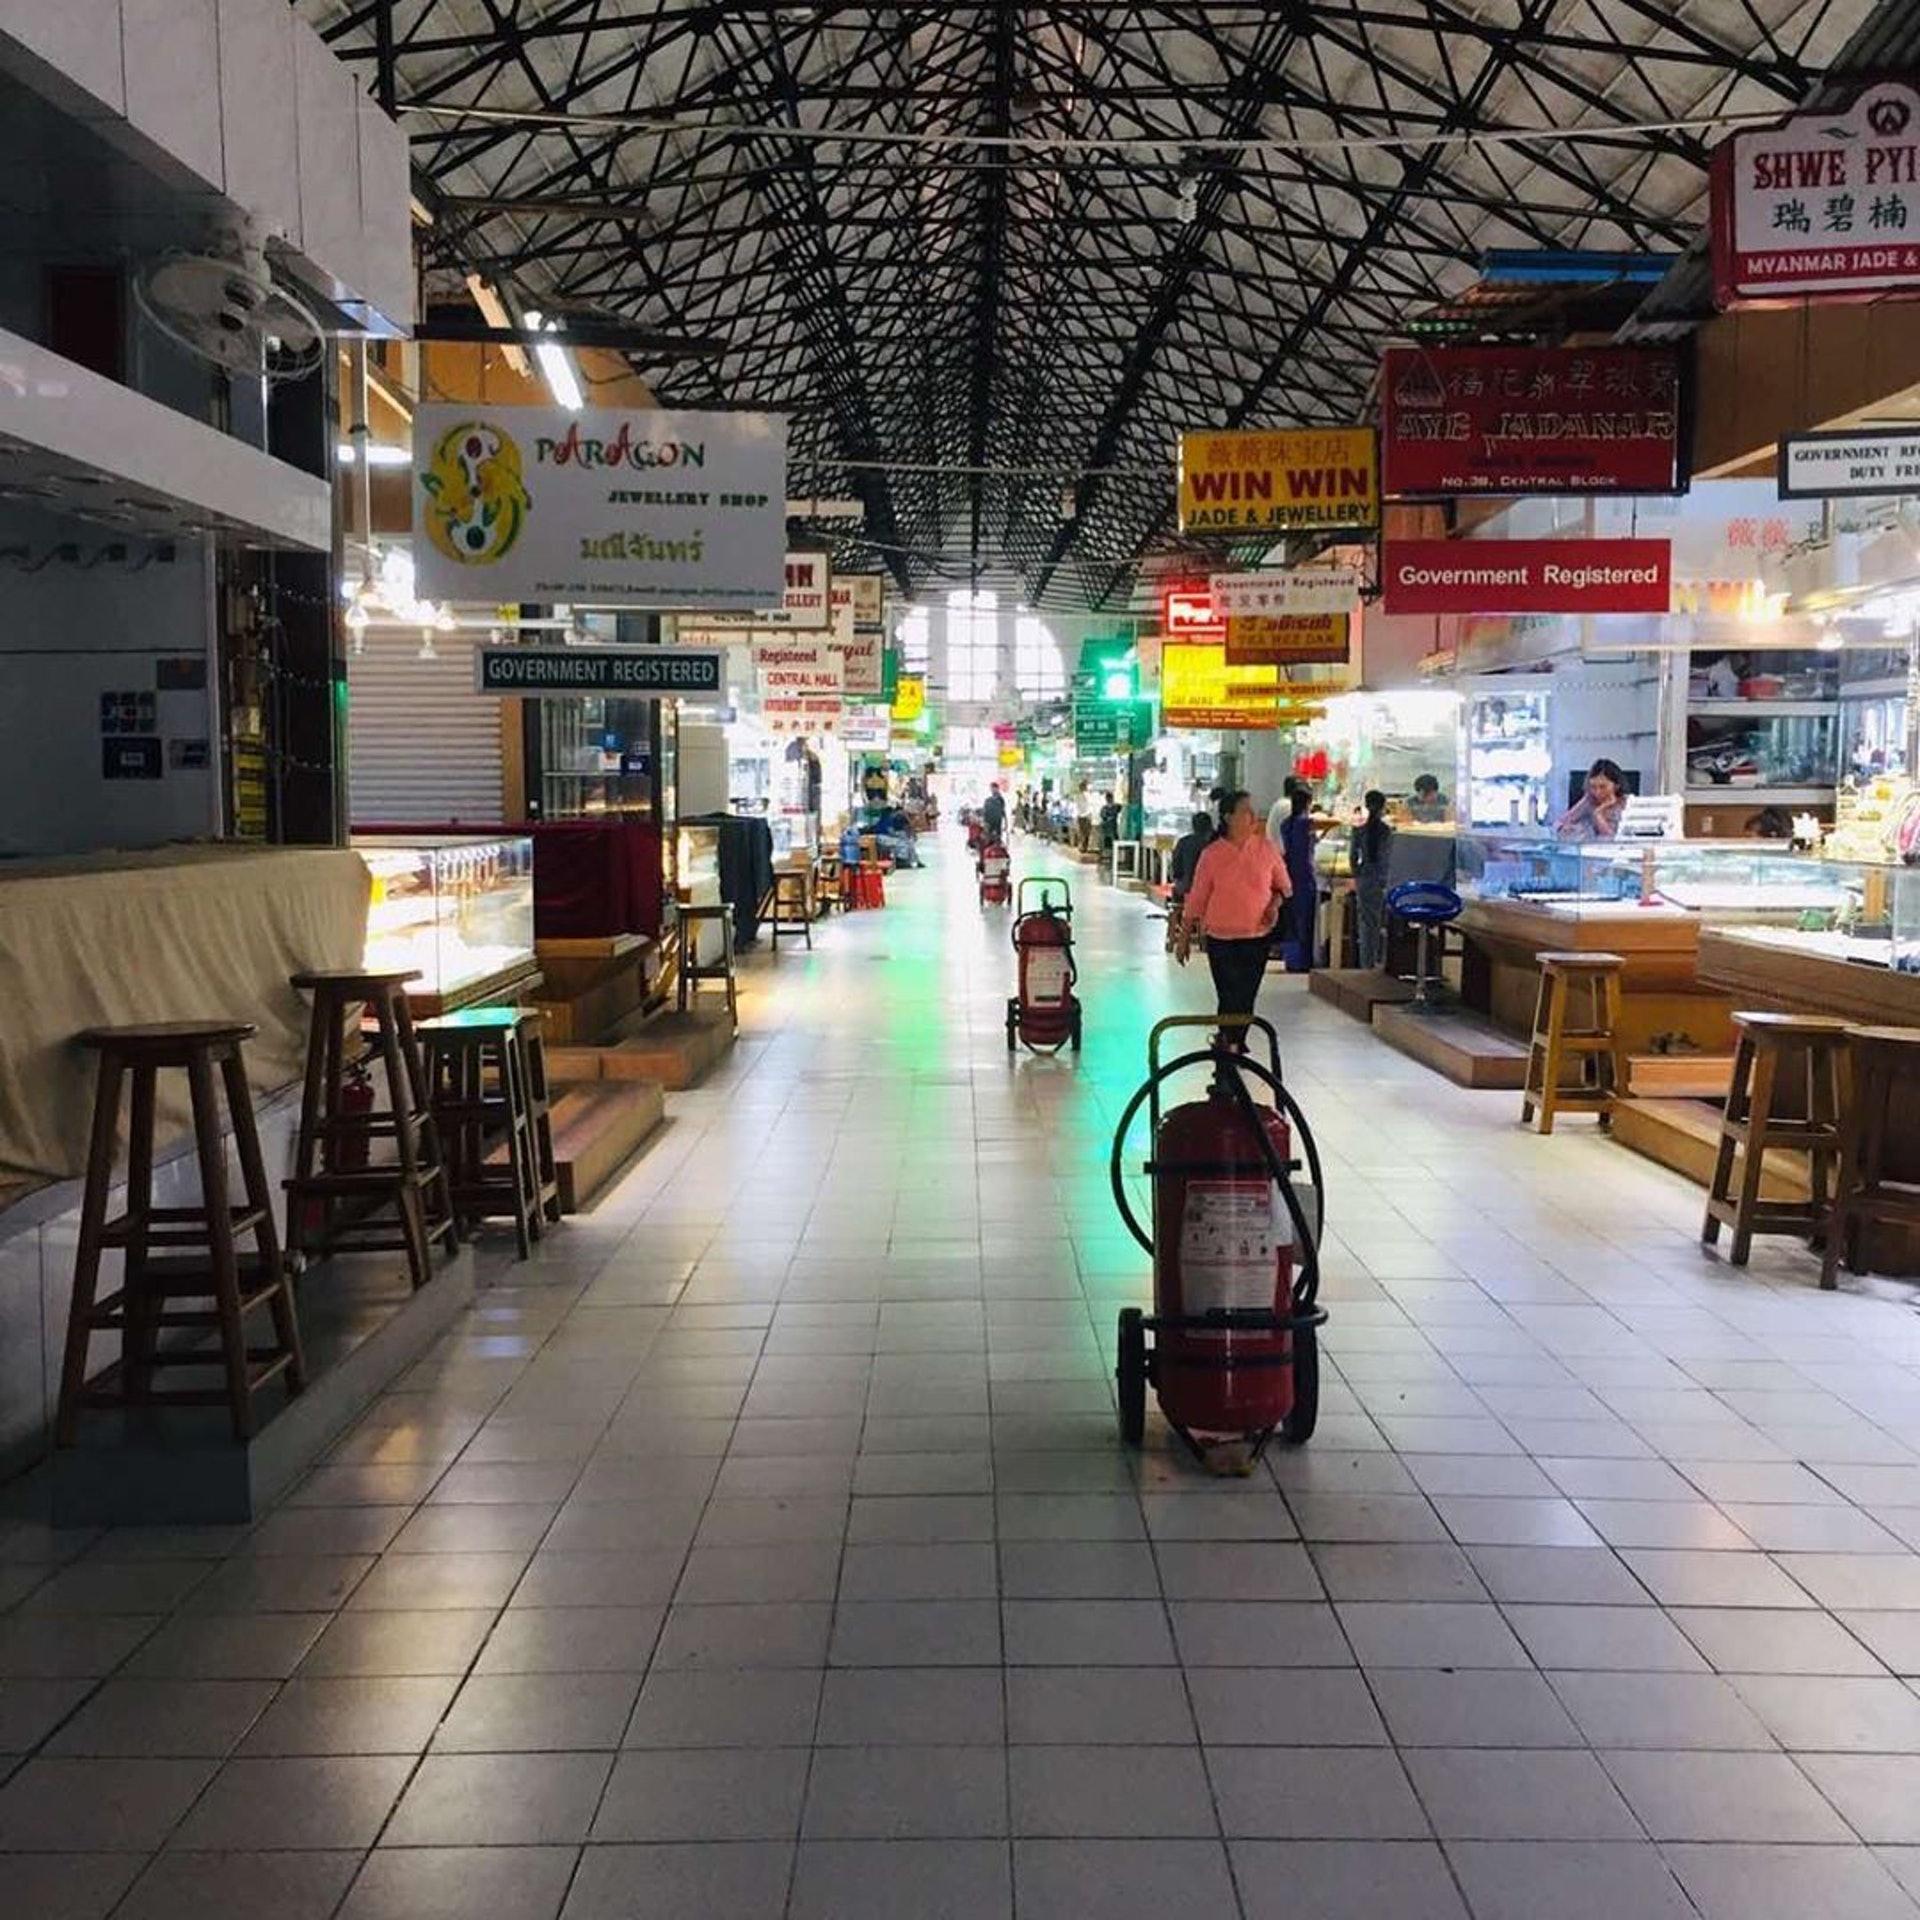 緬甸─仰光(Ig@haricobogyokeaungsanmarket)